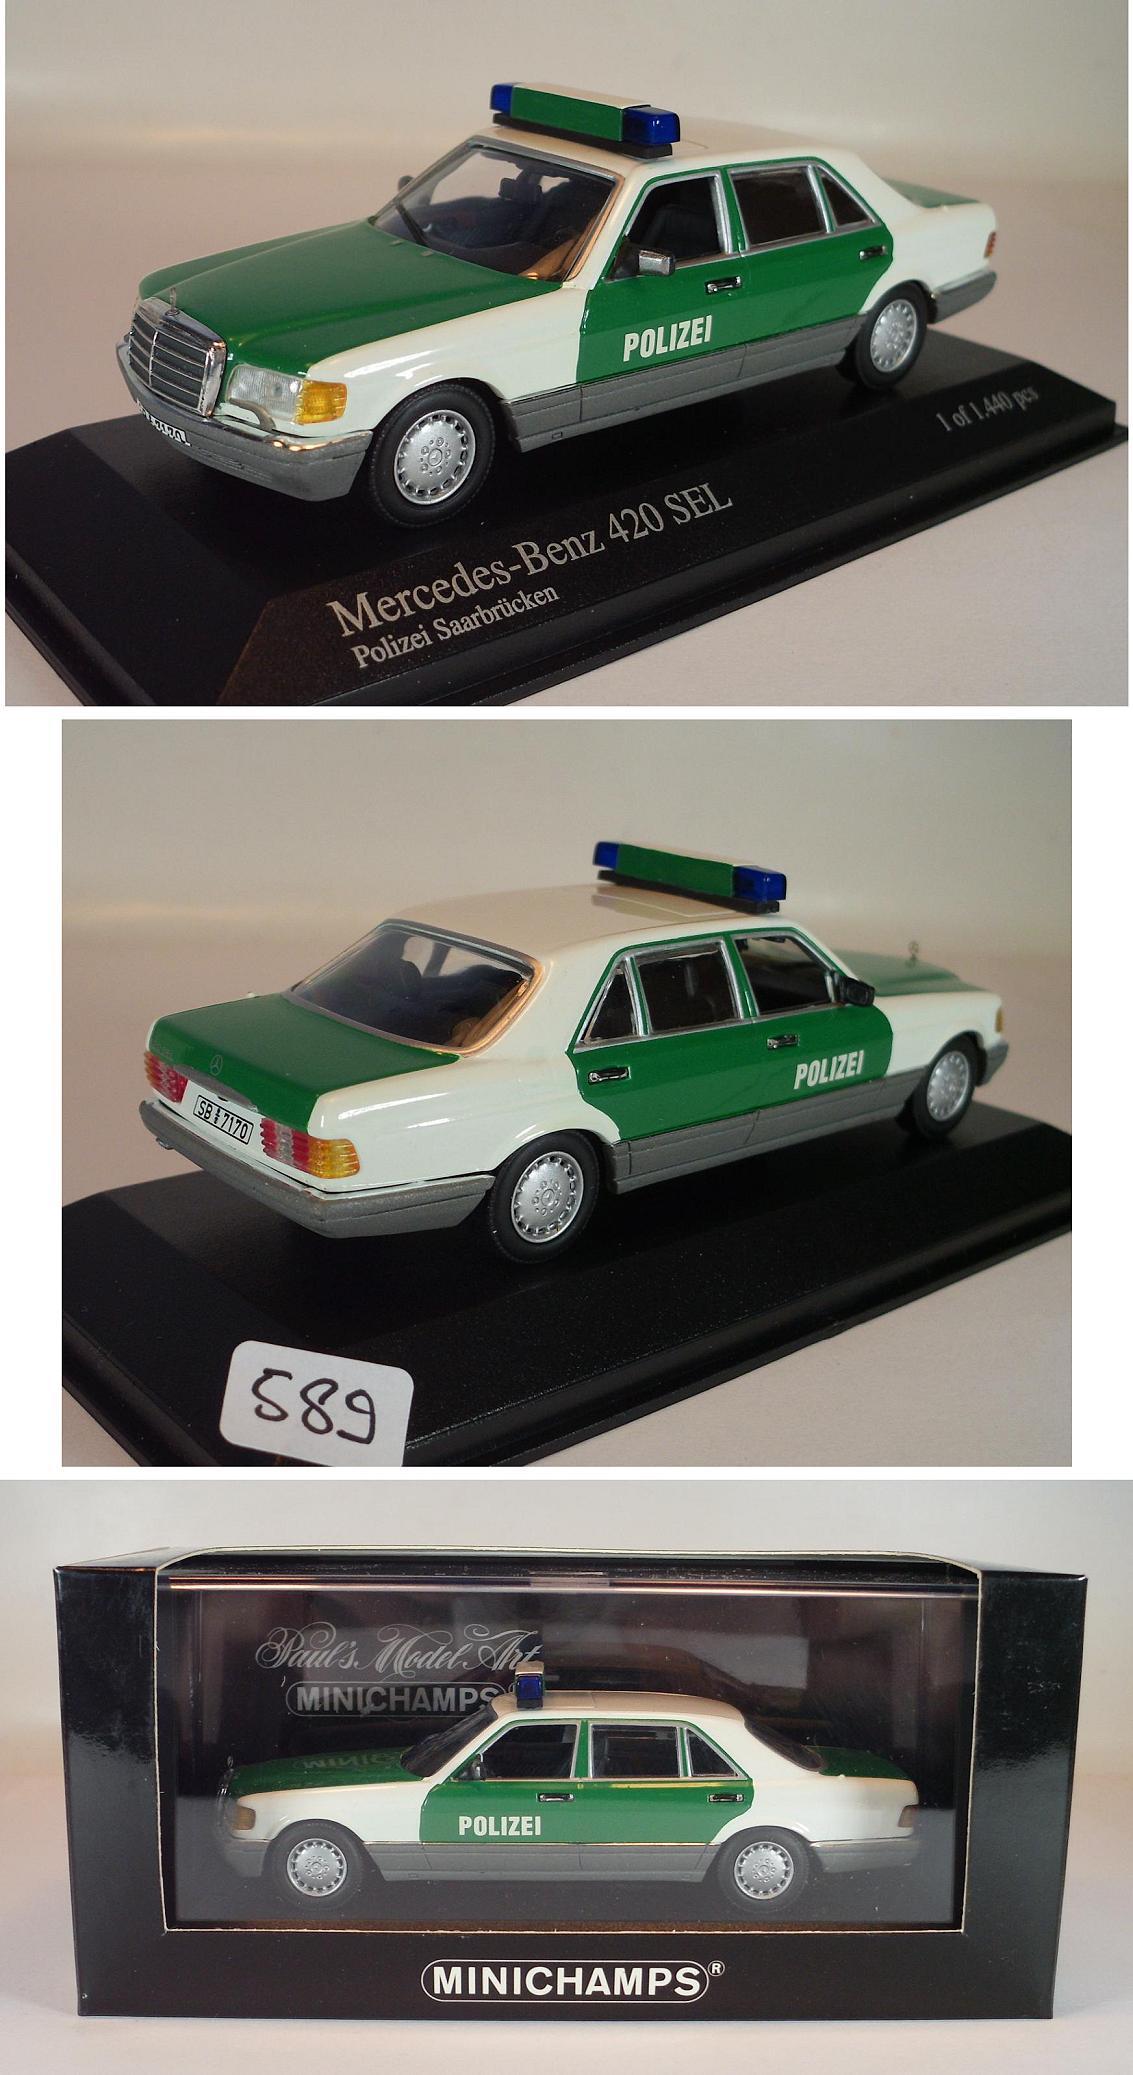 minichamps 1 43 mercedes benz 420 sel 1991 polizei saarbr cken ovp 589 ebay. Black Bedroom Furniture Sets. Home Design Ideas